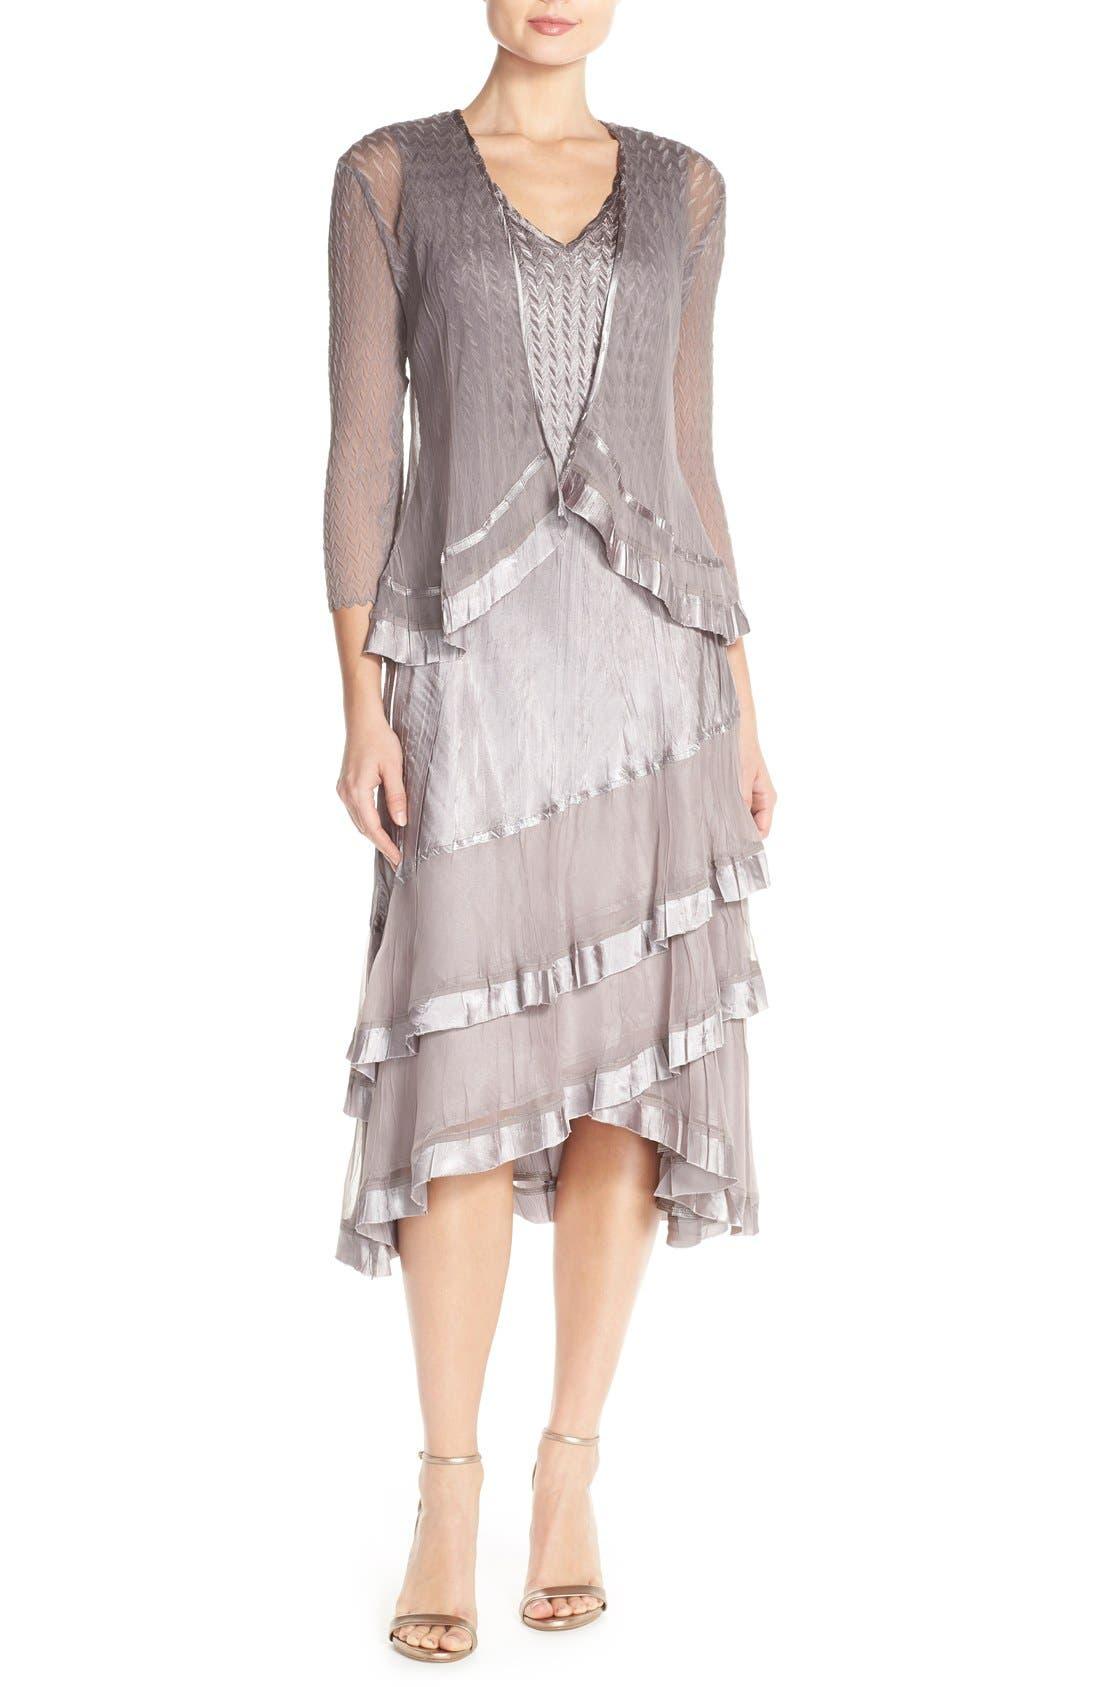 Vintage 1920s Dresses – Where to Buy Petite Womens Komarov Charmeuse A-Line Dress  Jacket Size Medium - Grey $438.00 AT vintagedancer.com